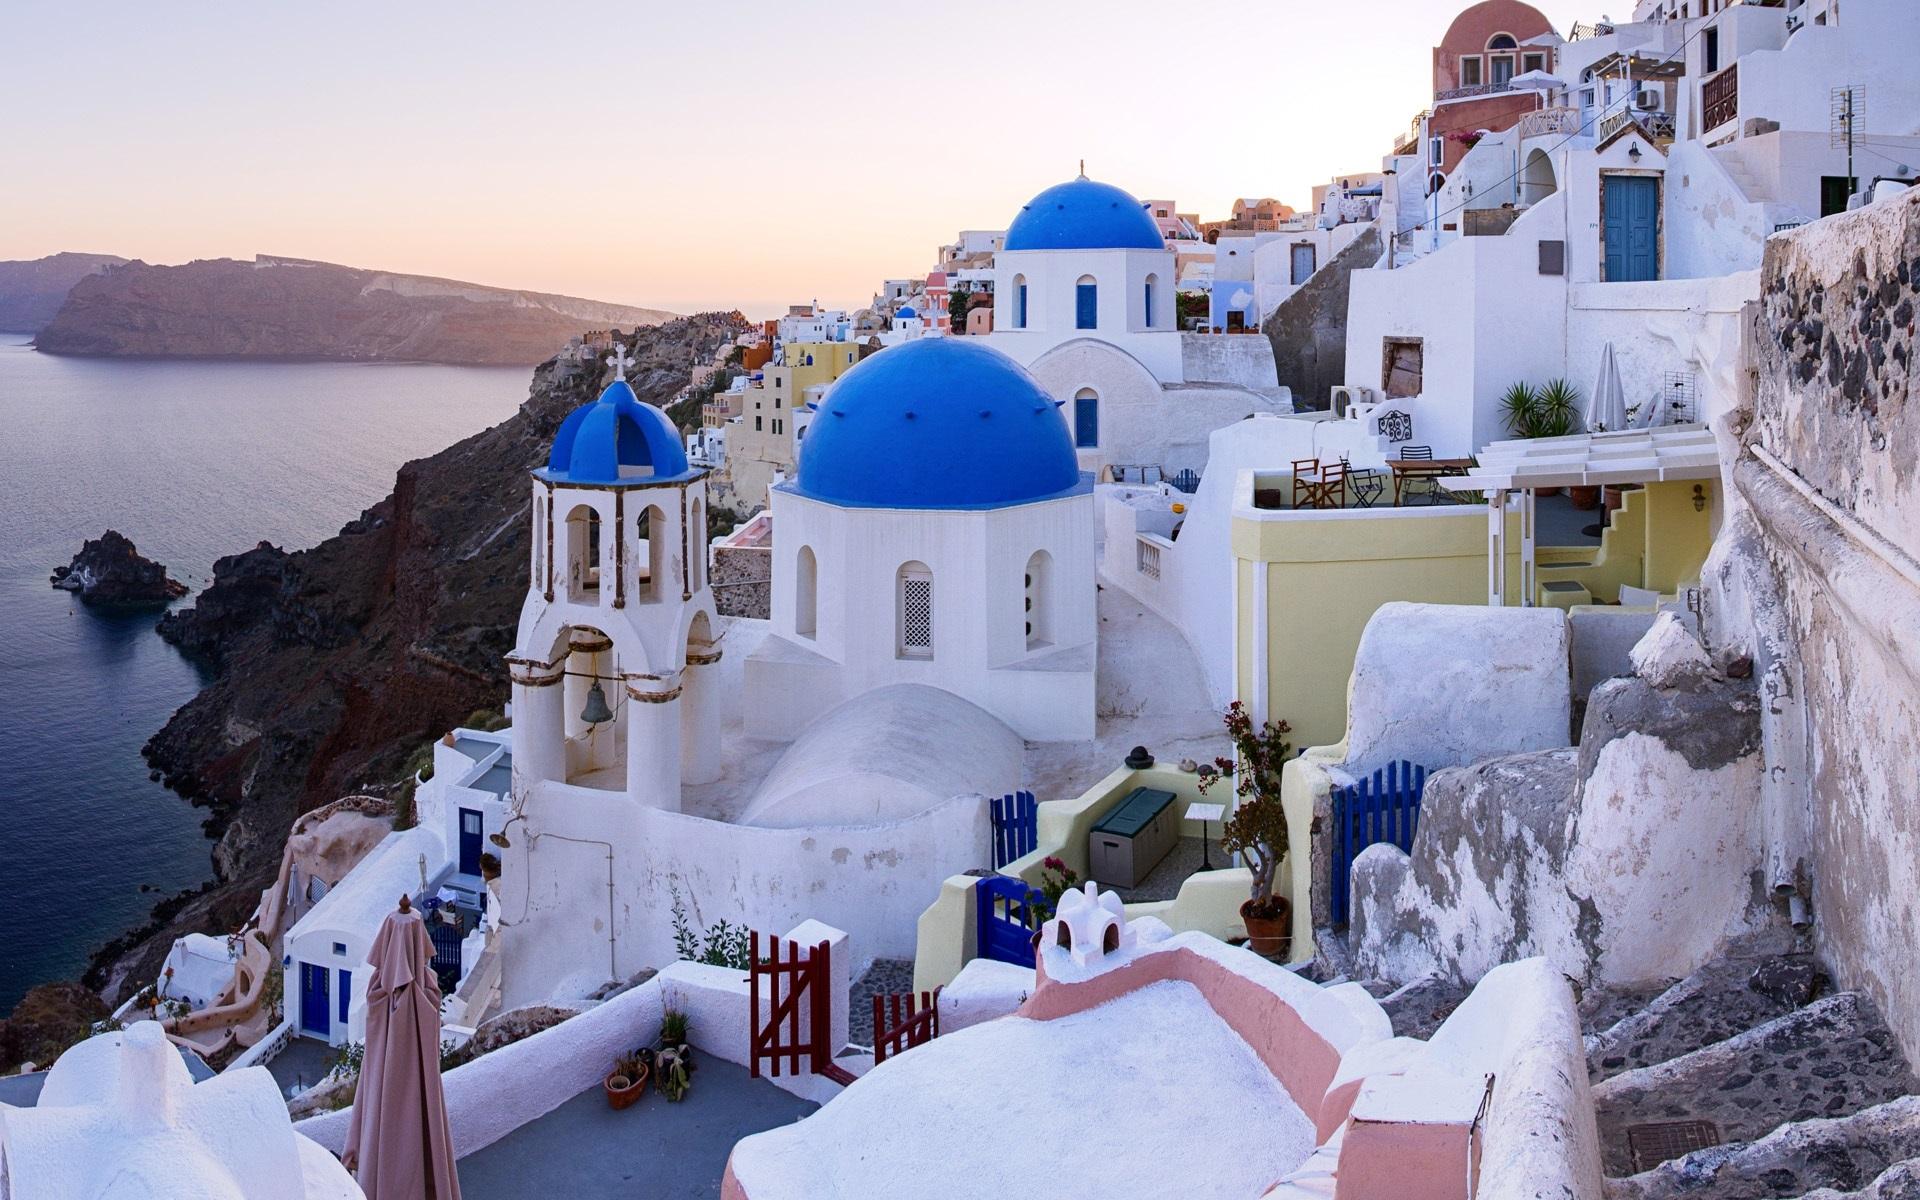 Wallpaper Oia Santorini Greece Sea Houses 3840x1200